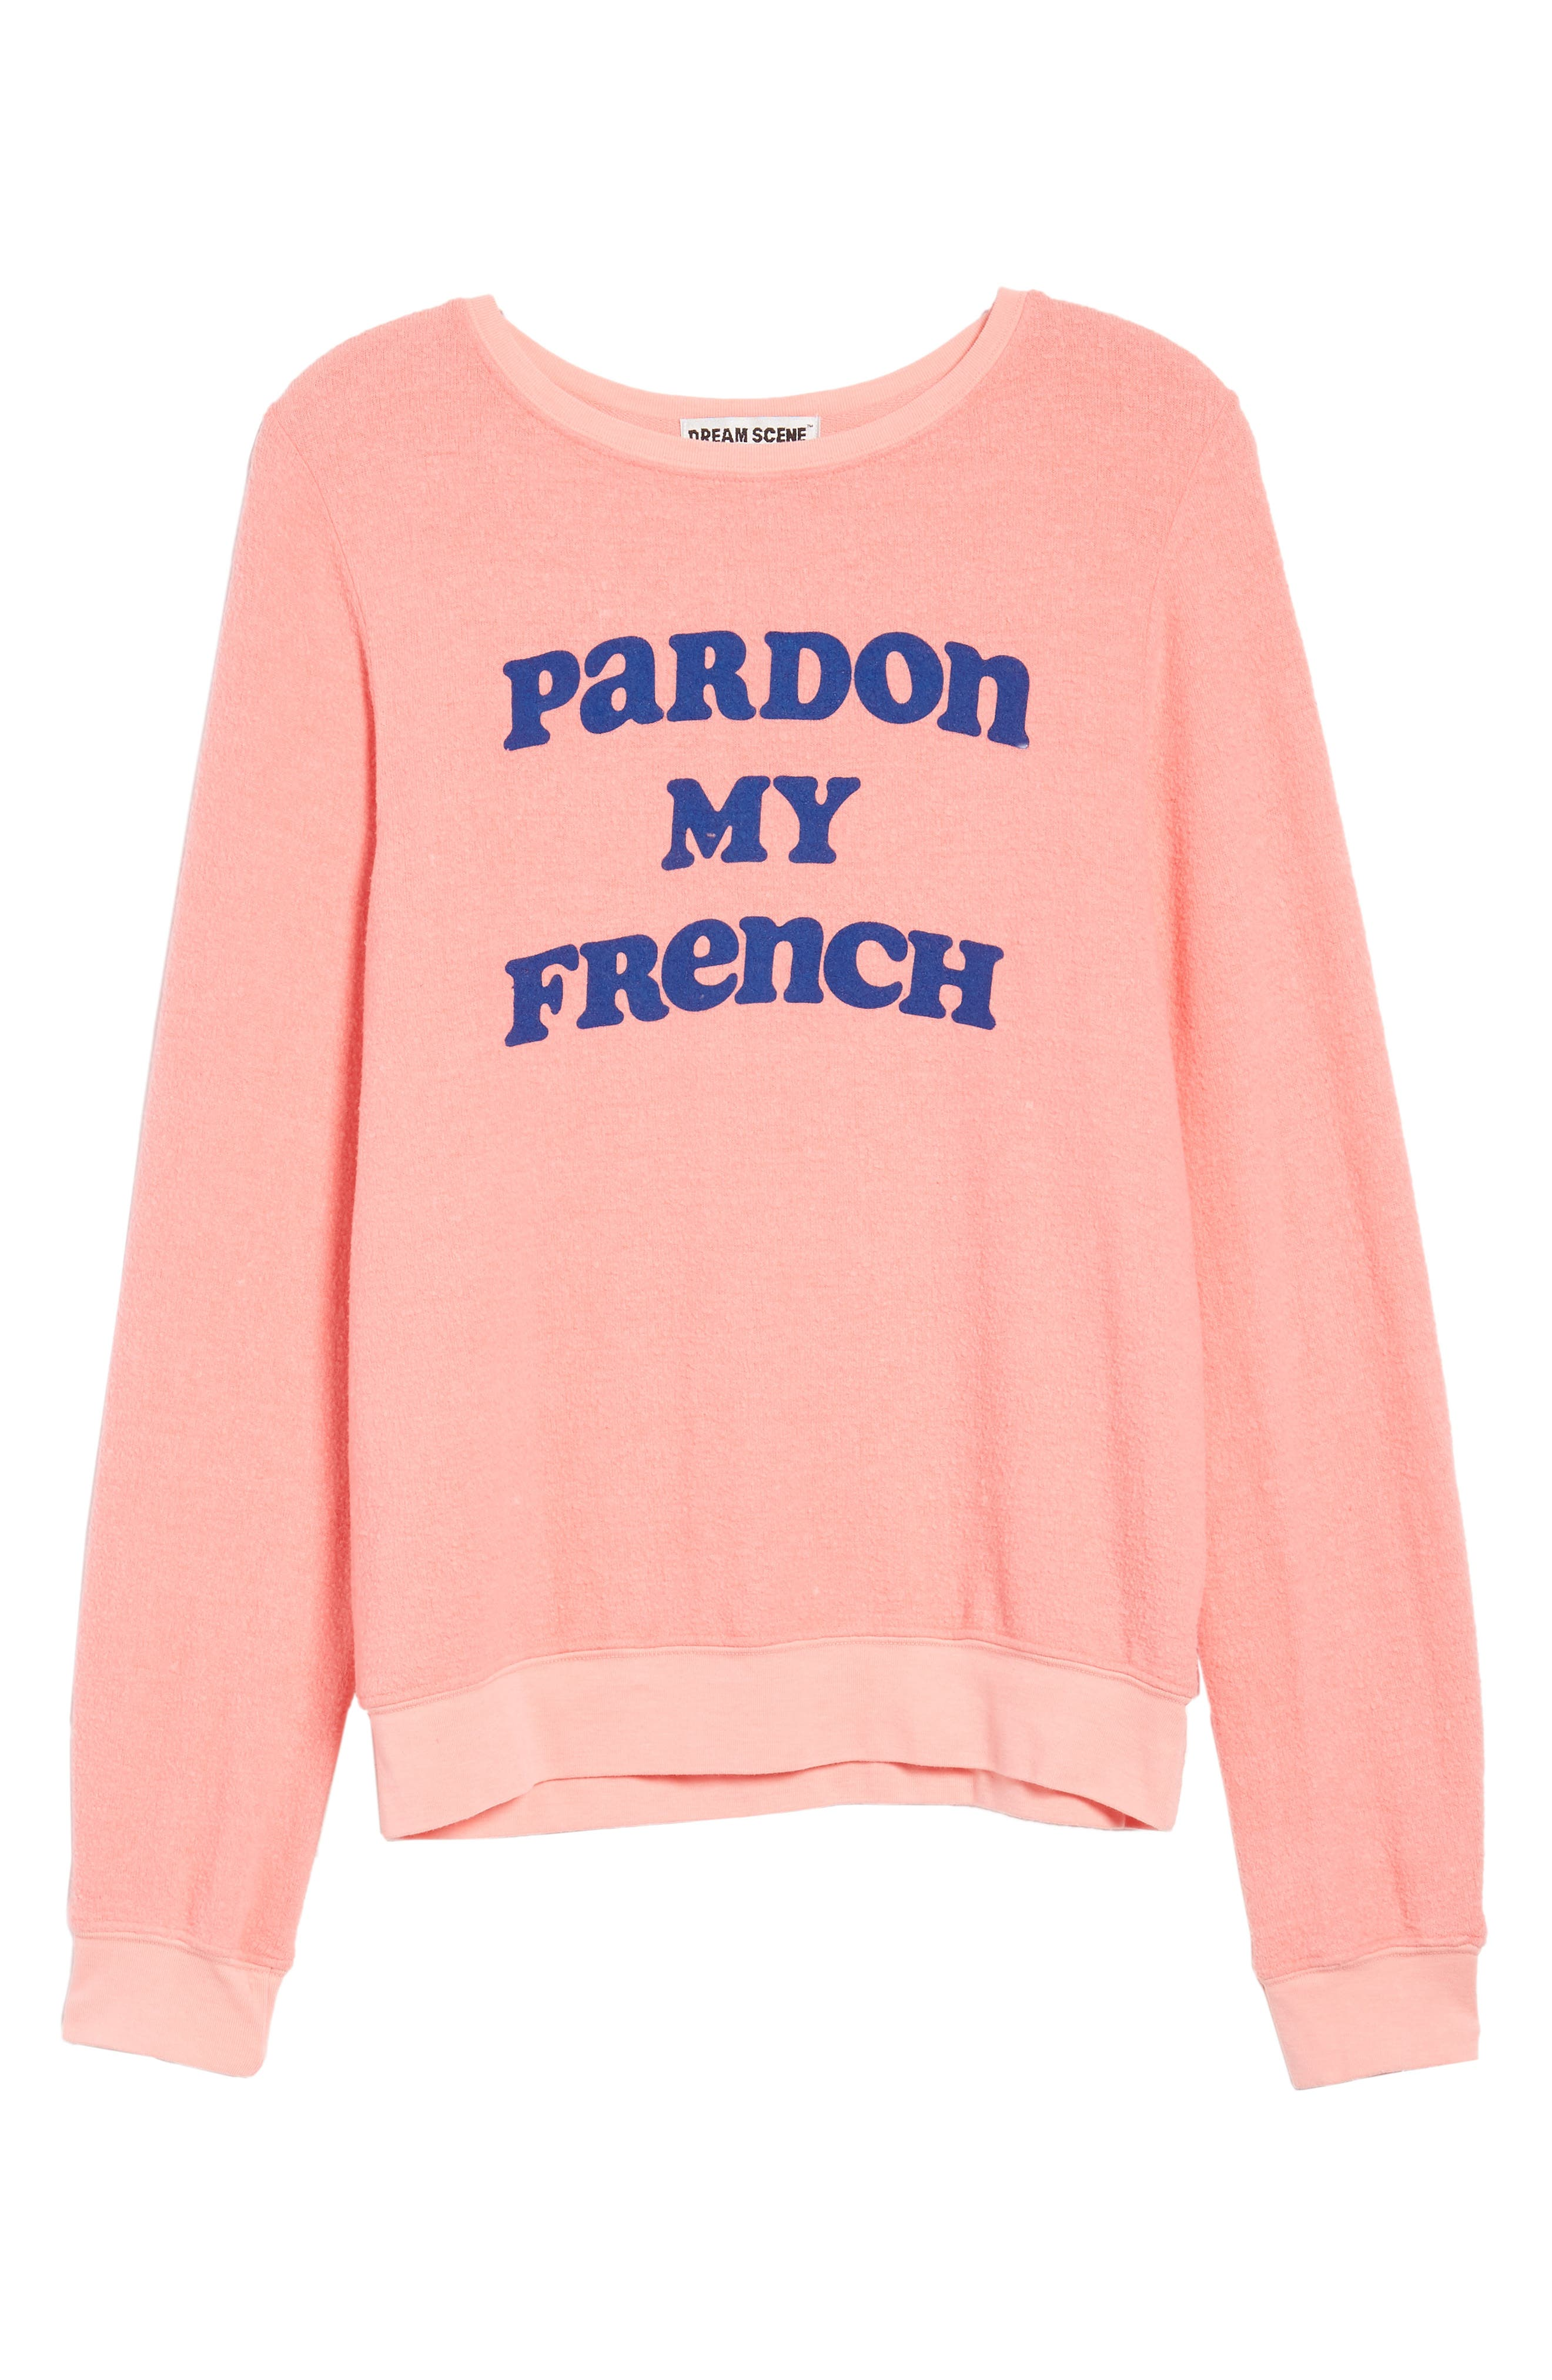 Pardon My French Sweatshirt,                             Alternate thumbnail 7, color,                             950